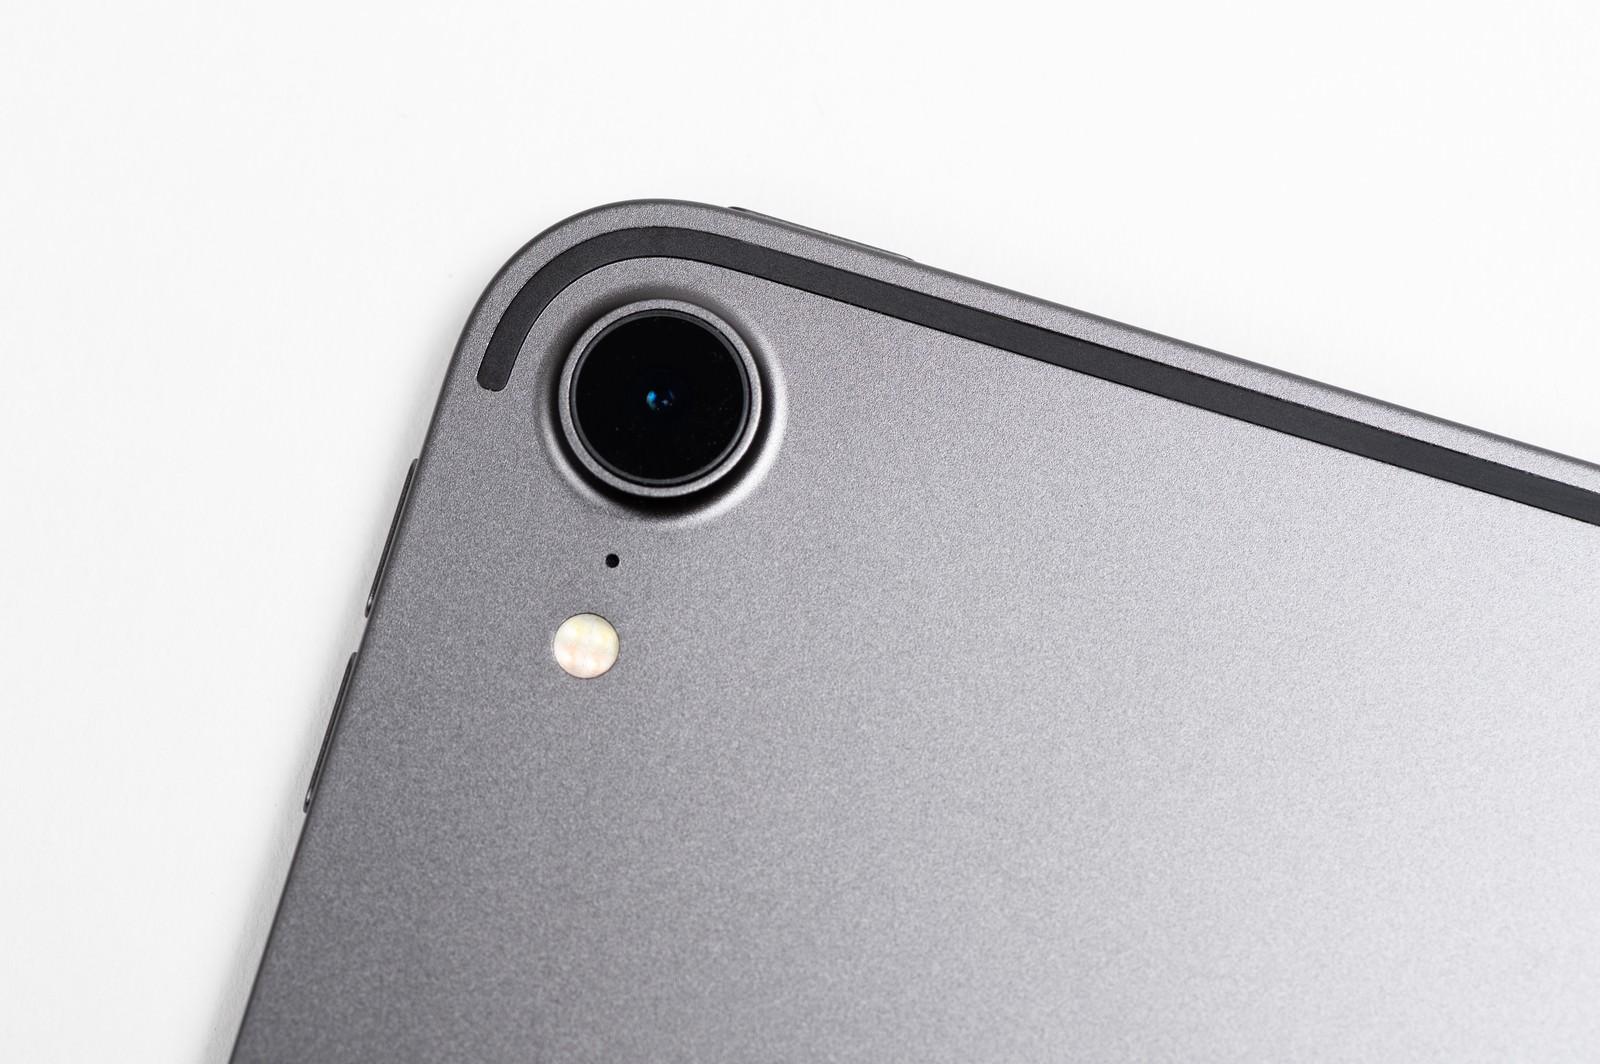 「iPad Pro のカメラ(12メガピクセルカメラ)」の写真